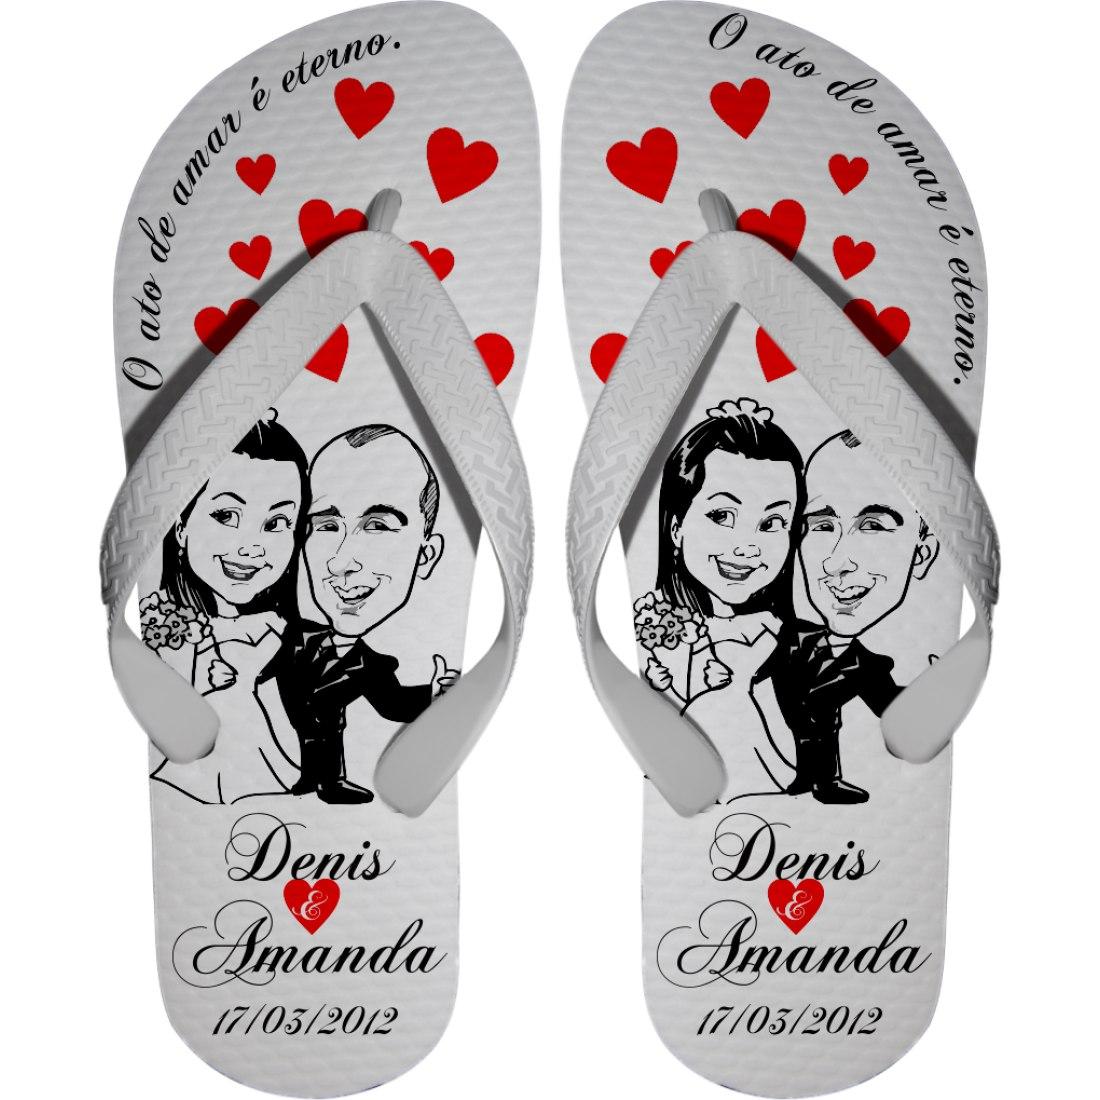 Resultado de imagem para havaianas casamento personalizadas